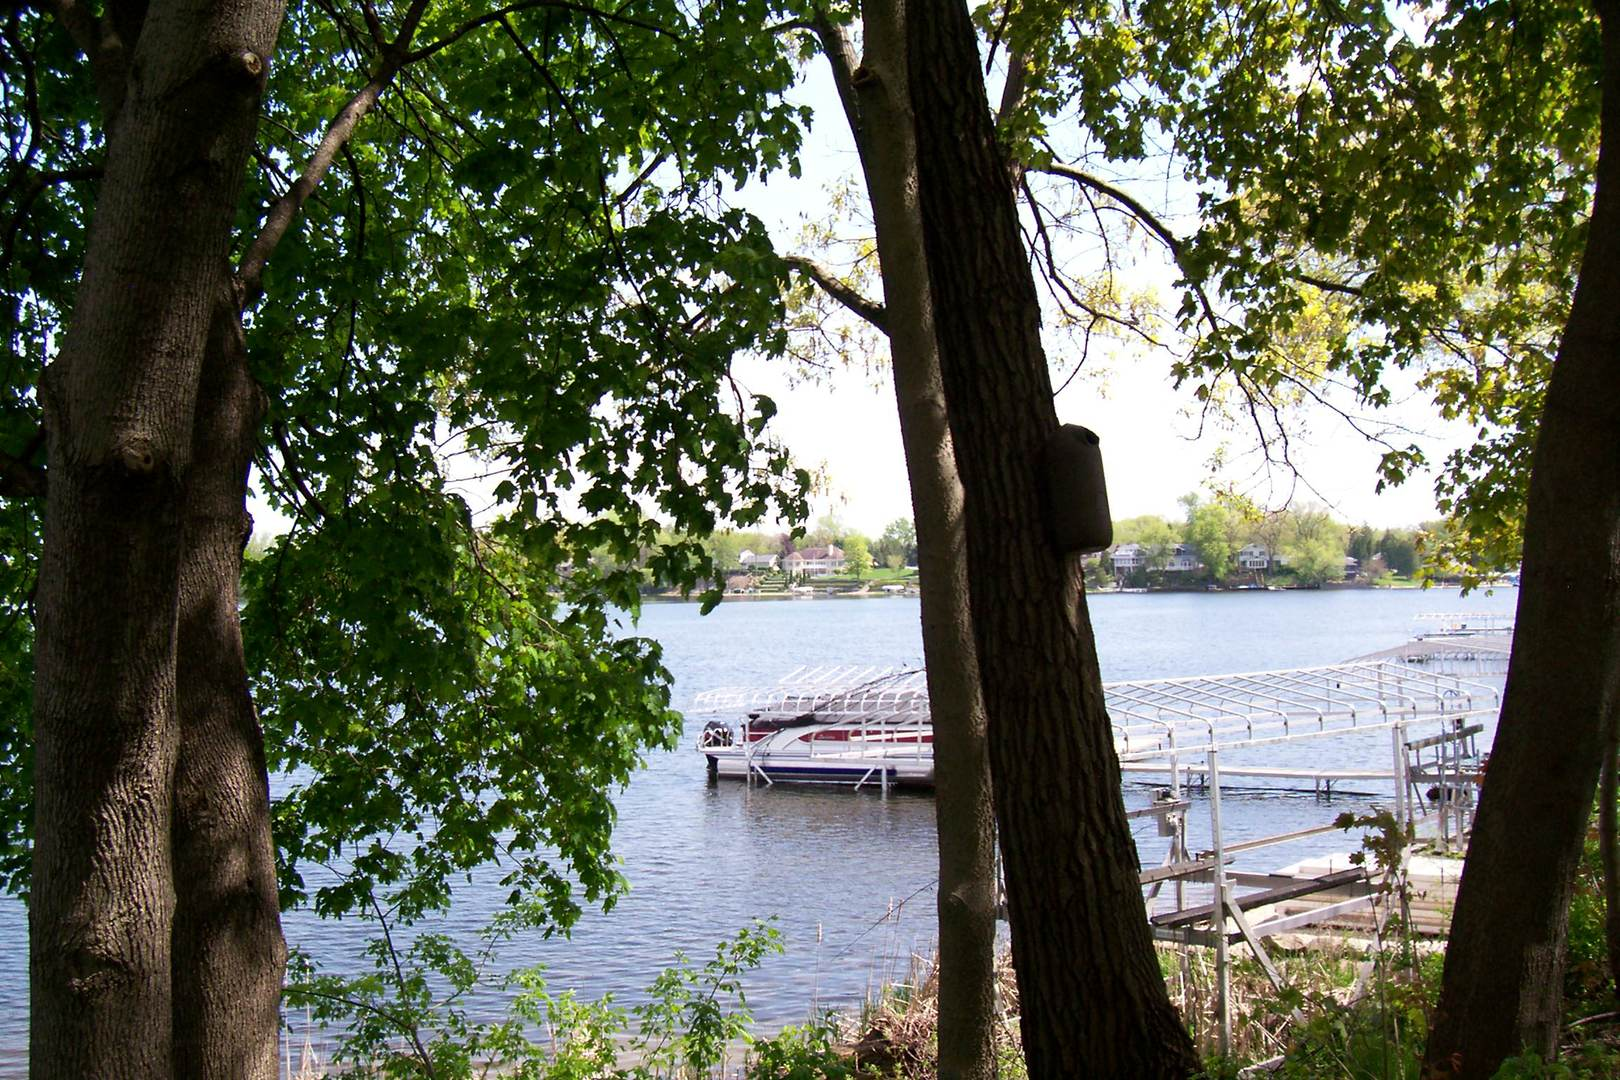 42527 North WOODBINE, ANTIOCH, Illinois, 60002